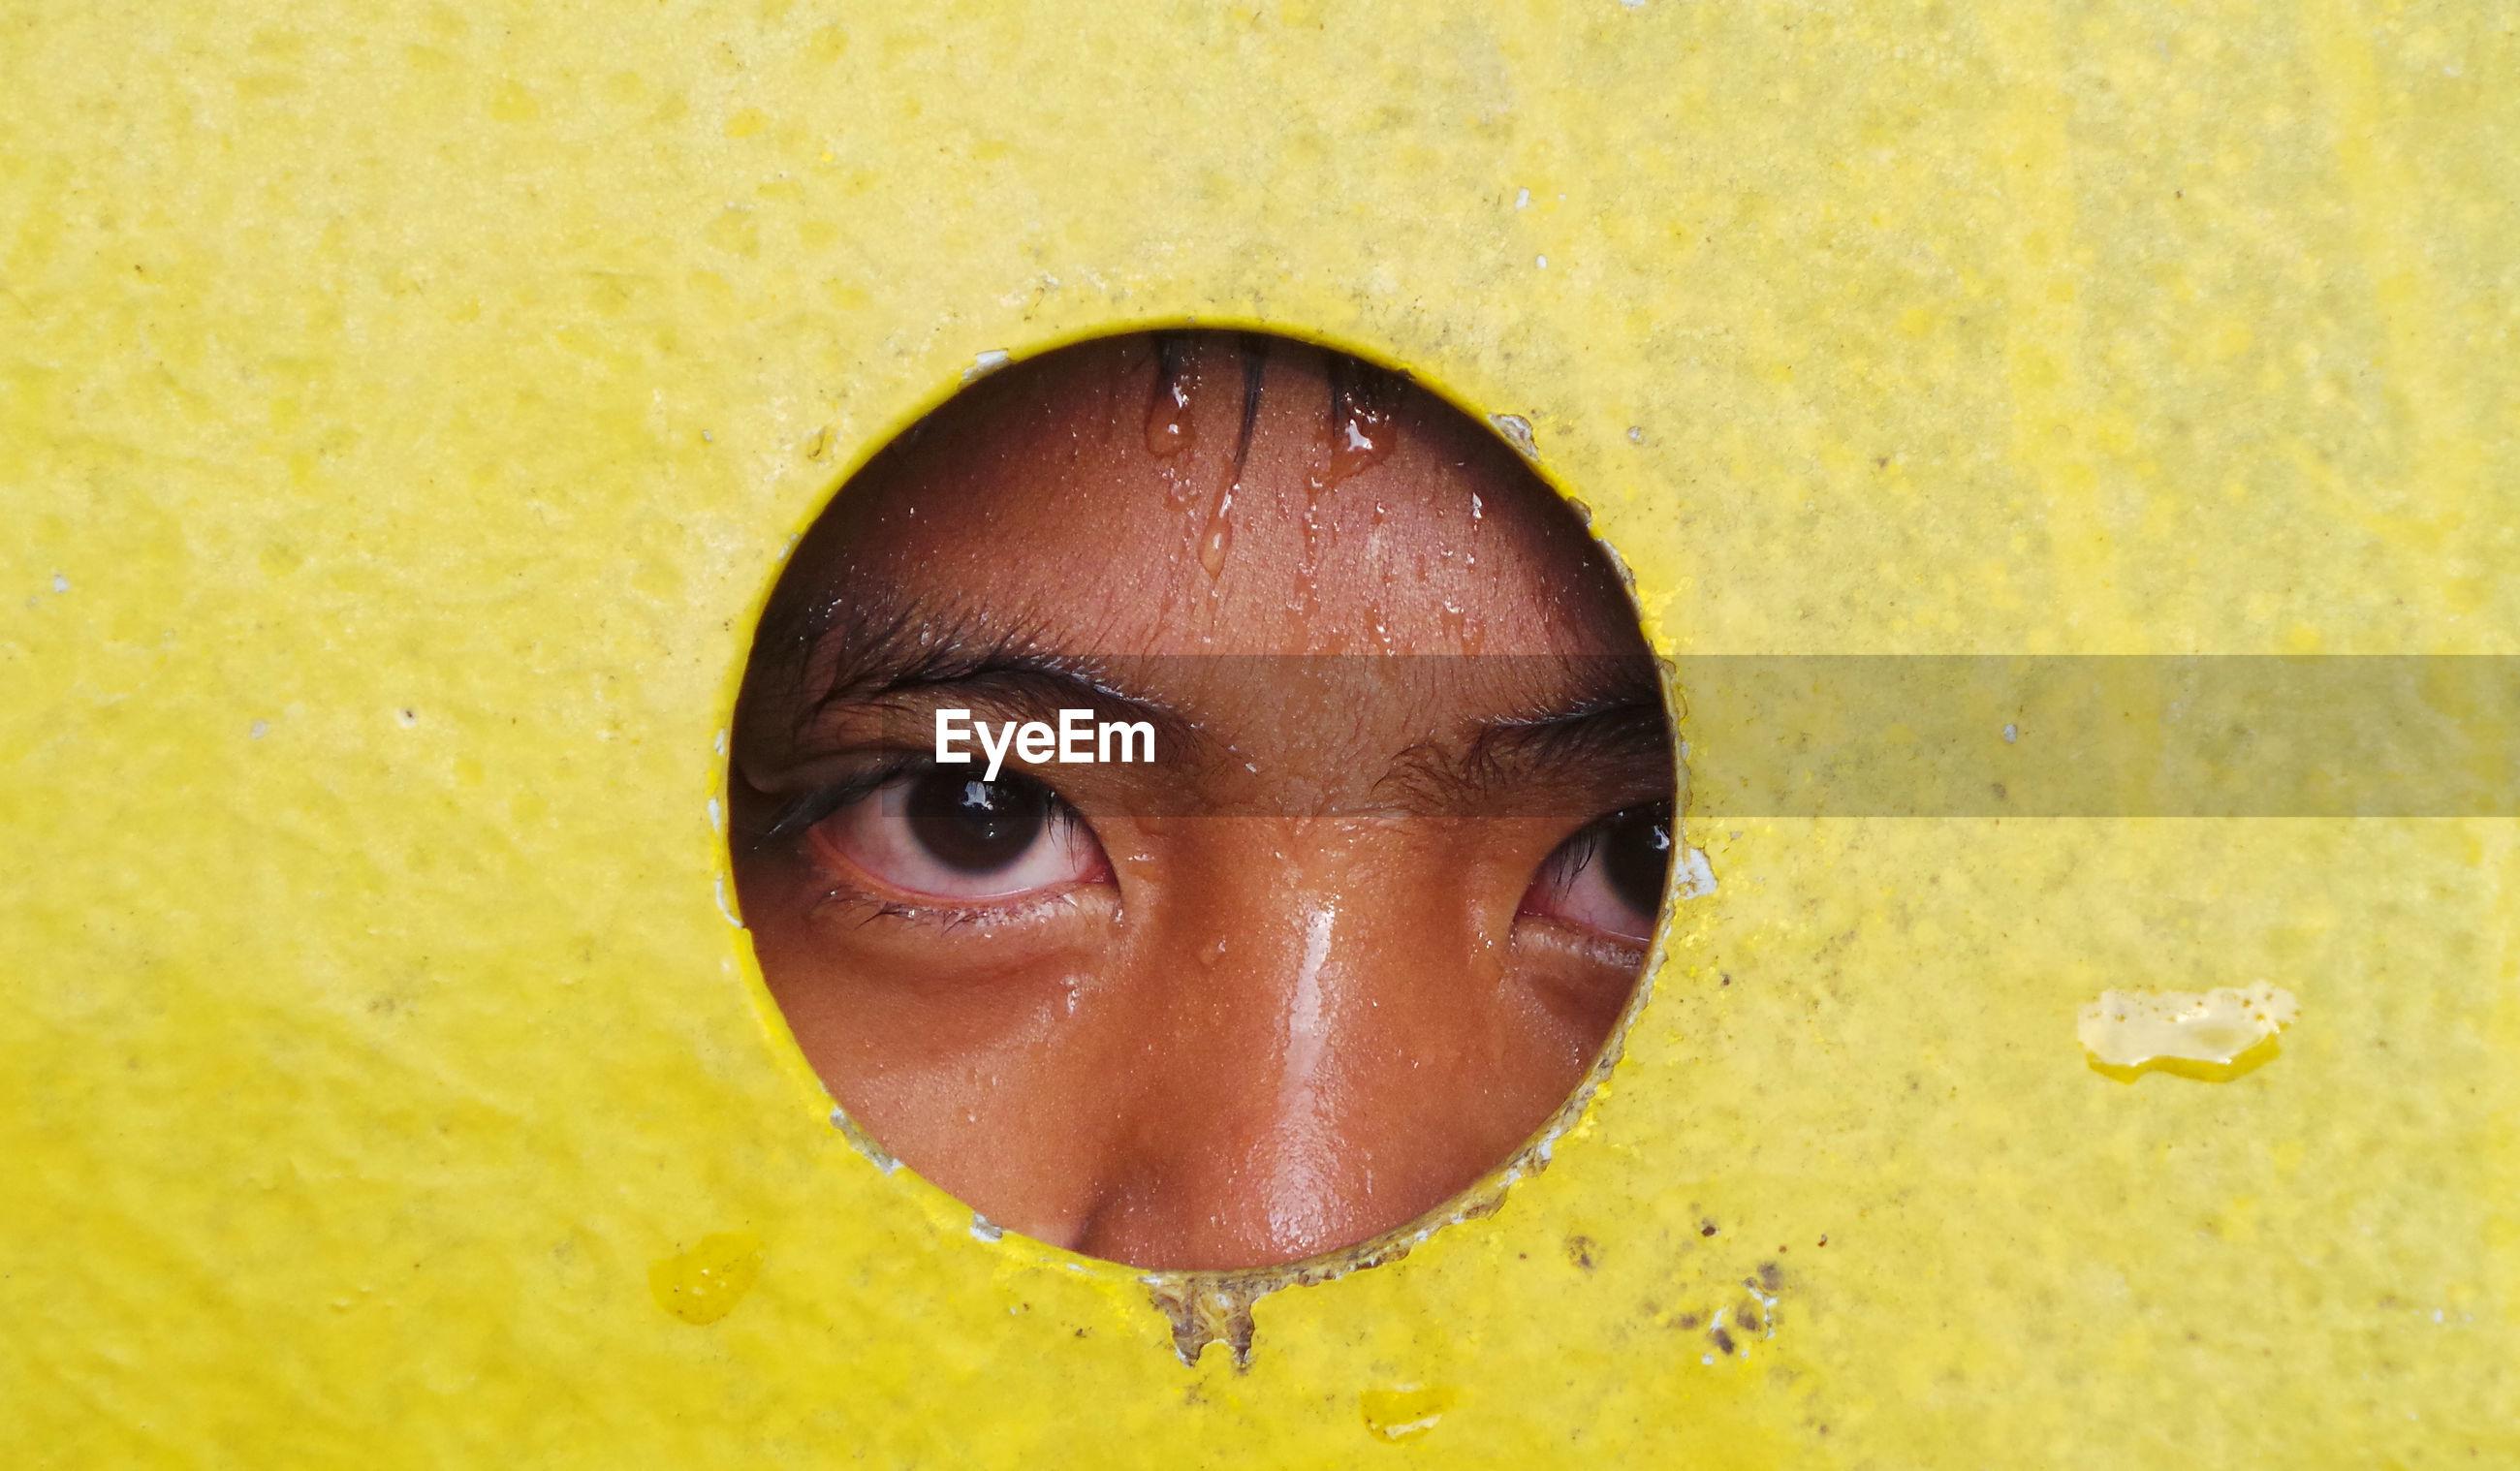 Portrait of wet person peeking through hole